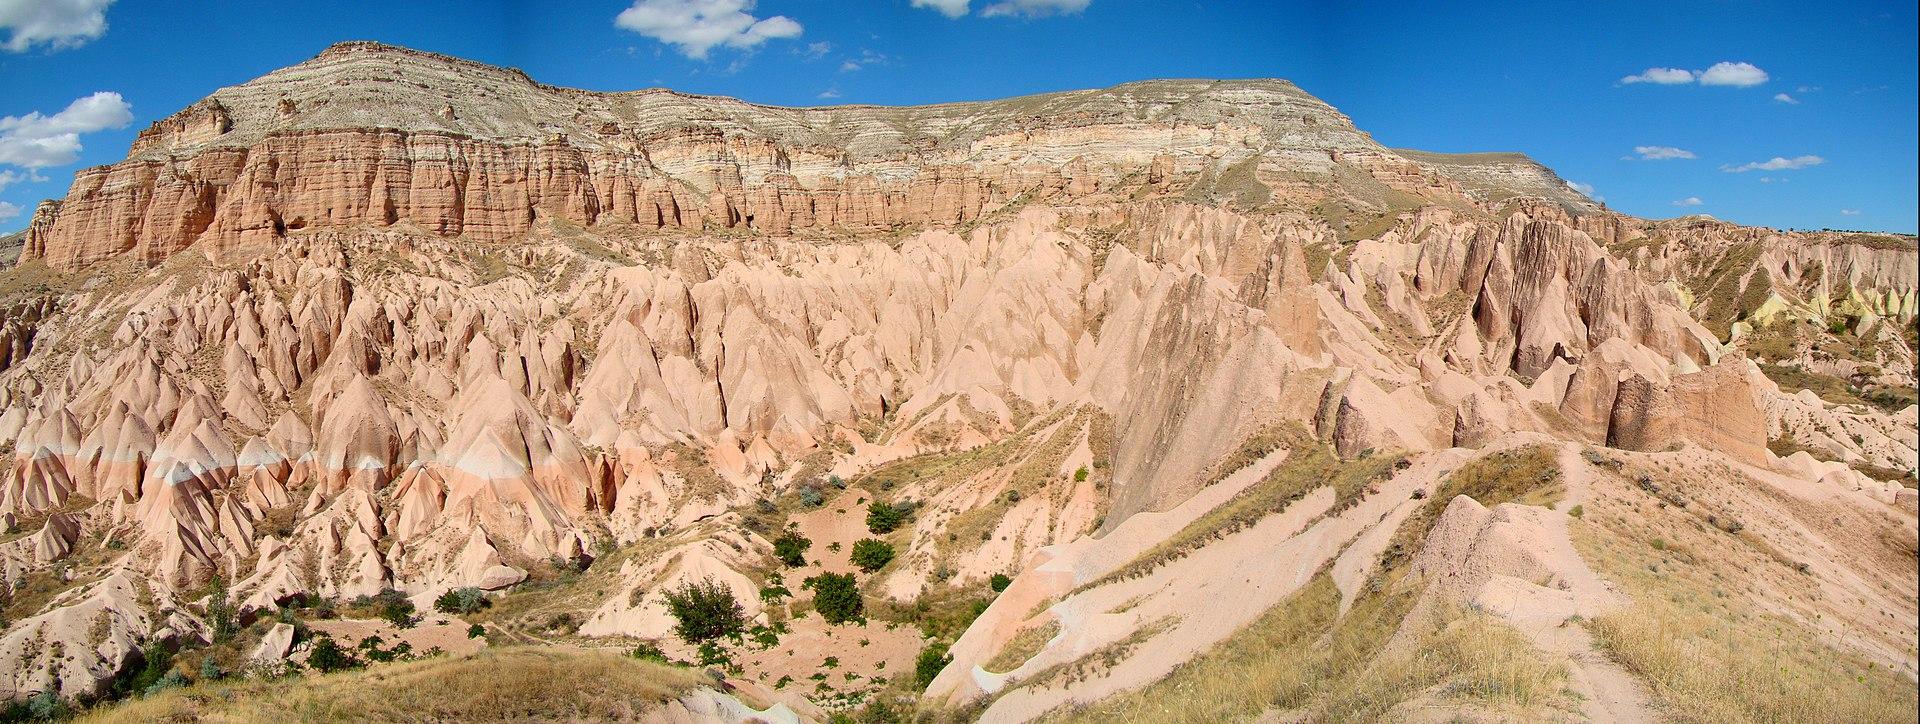 "Aktepe ""White Hill"" near Göreme and the Rock Sites of Cappadocia (UNESCO World Heritage Site)"